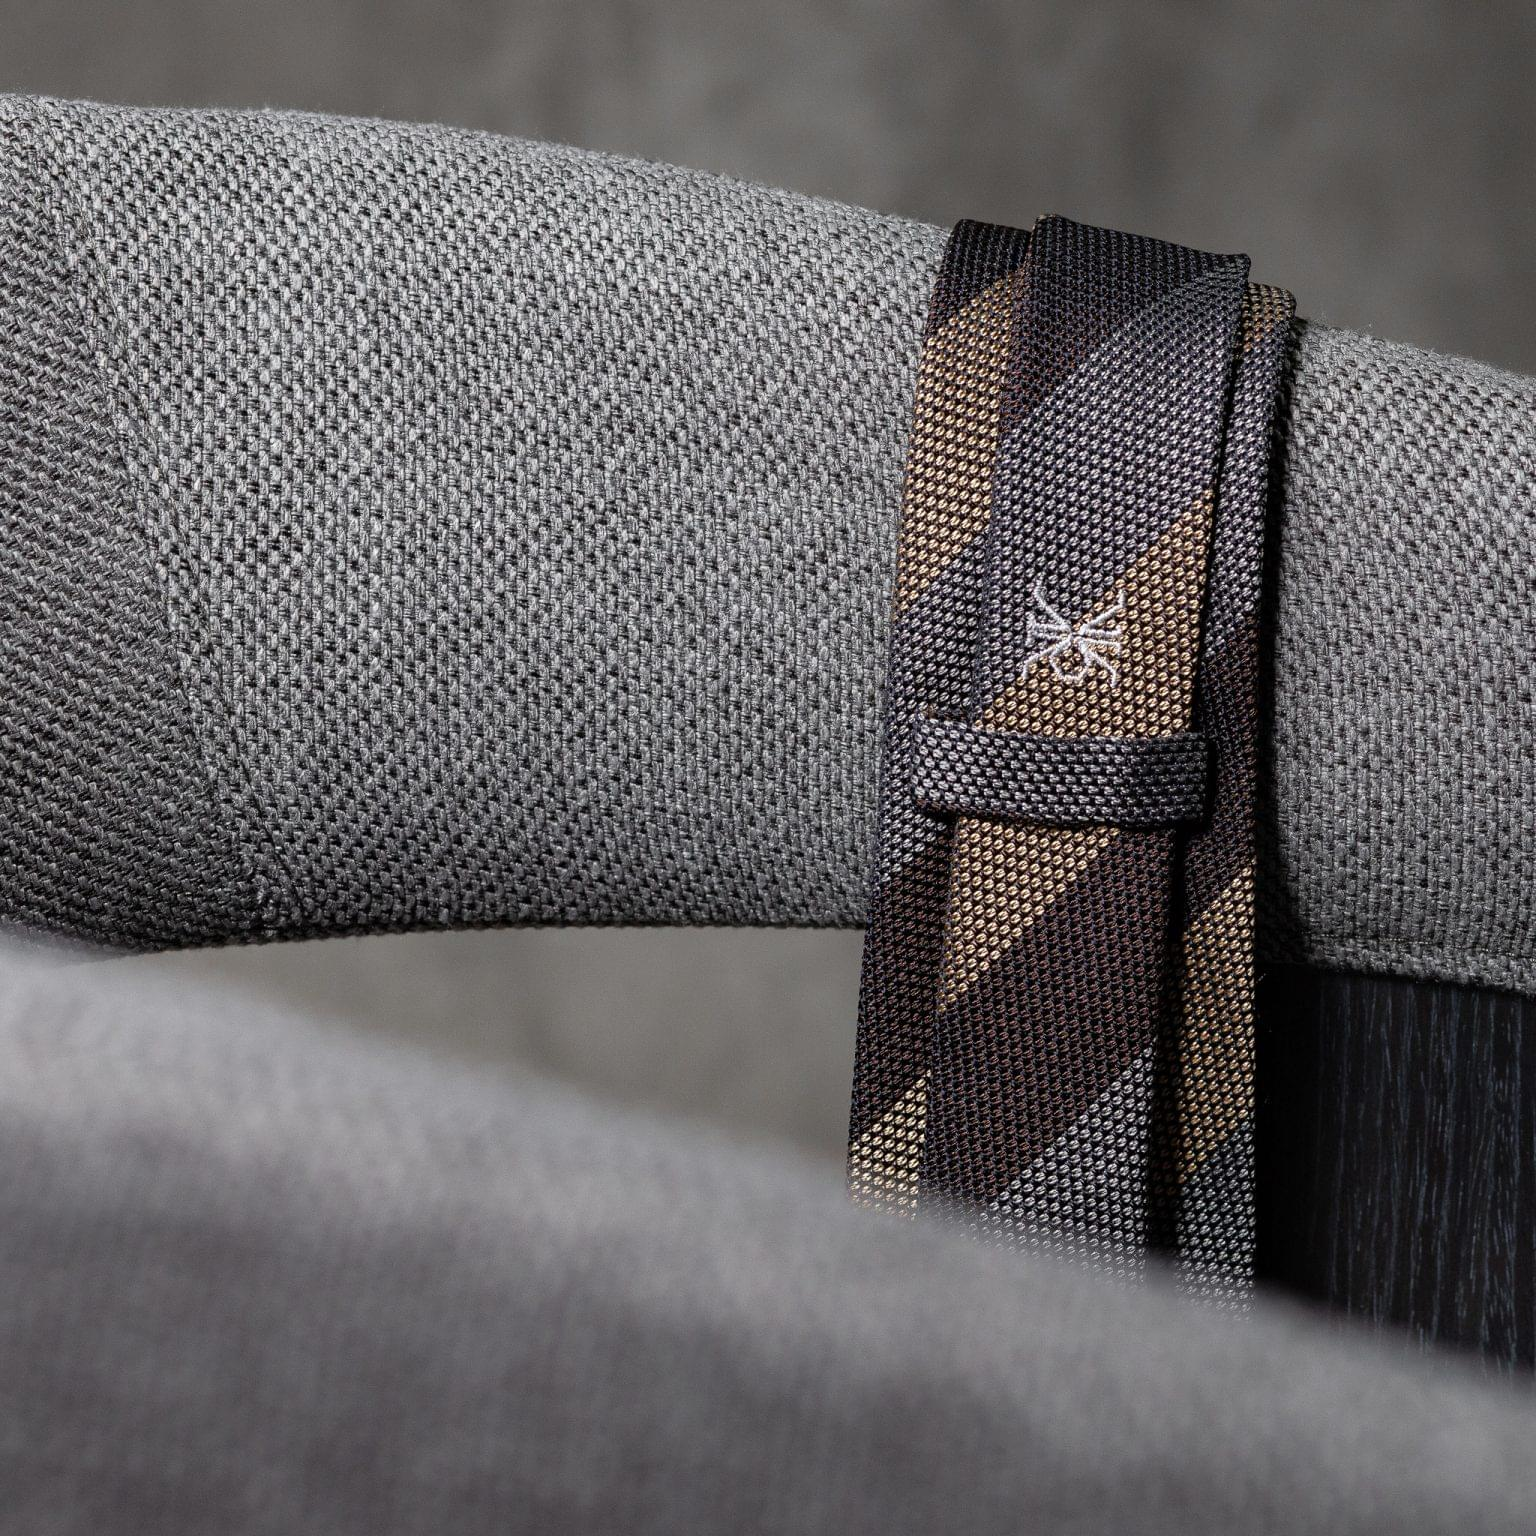 GRENADINE-0532-Tie-Initials-Corbata-Iniciales-The-Seelk-4